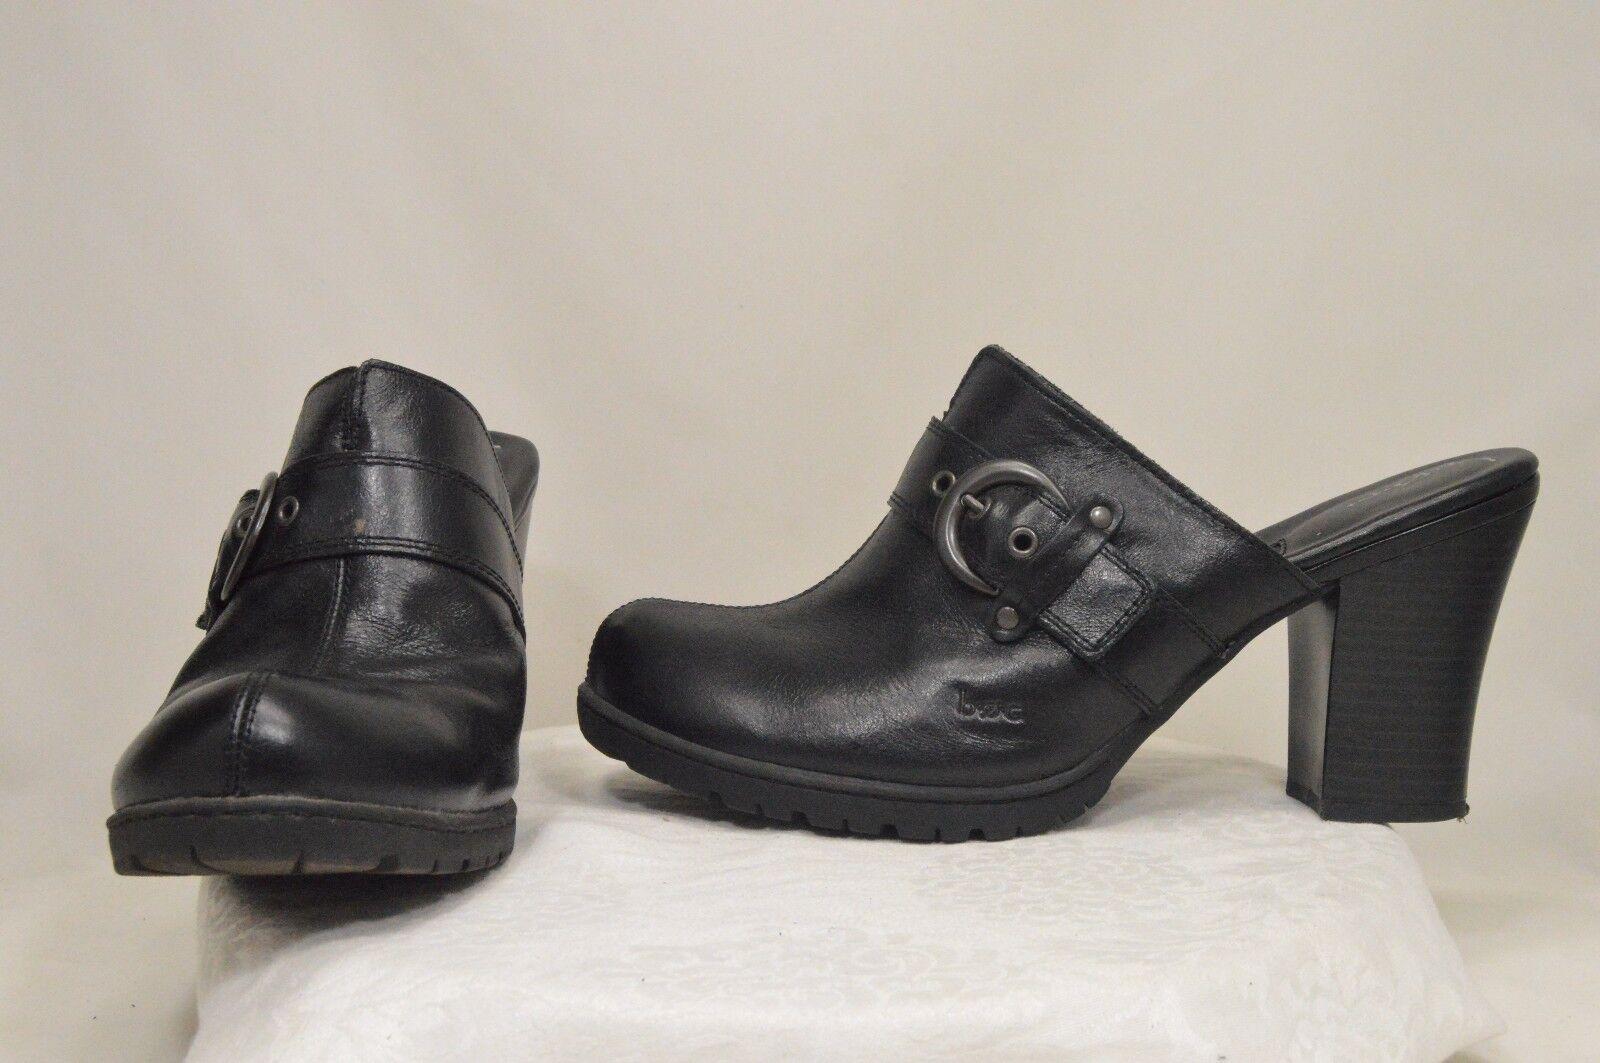 61454222d08 Black Leather Fashion Casual Dress Comfort Work Slide Mule Heels ...